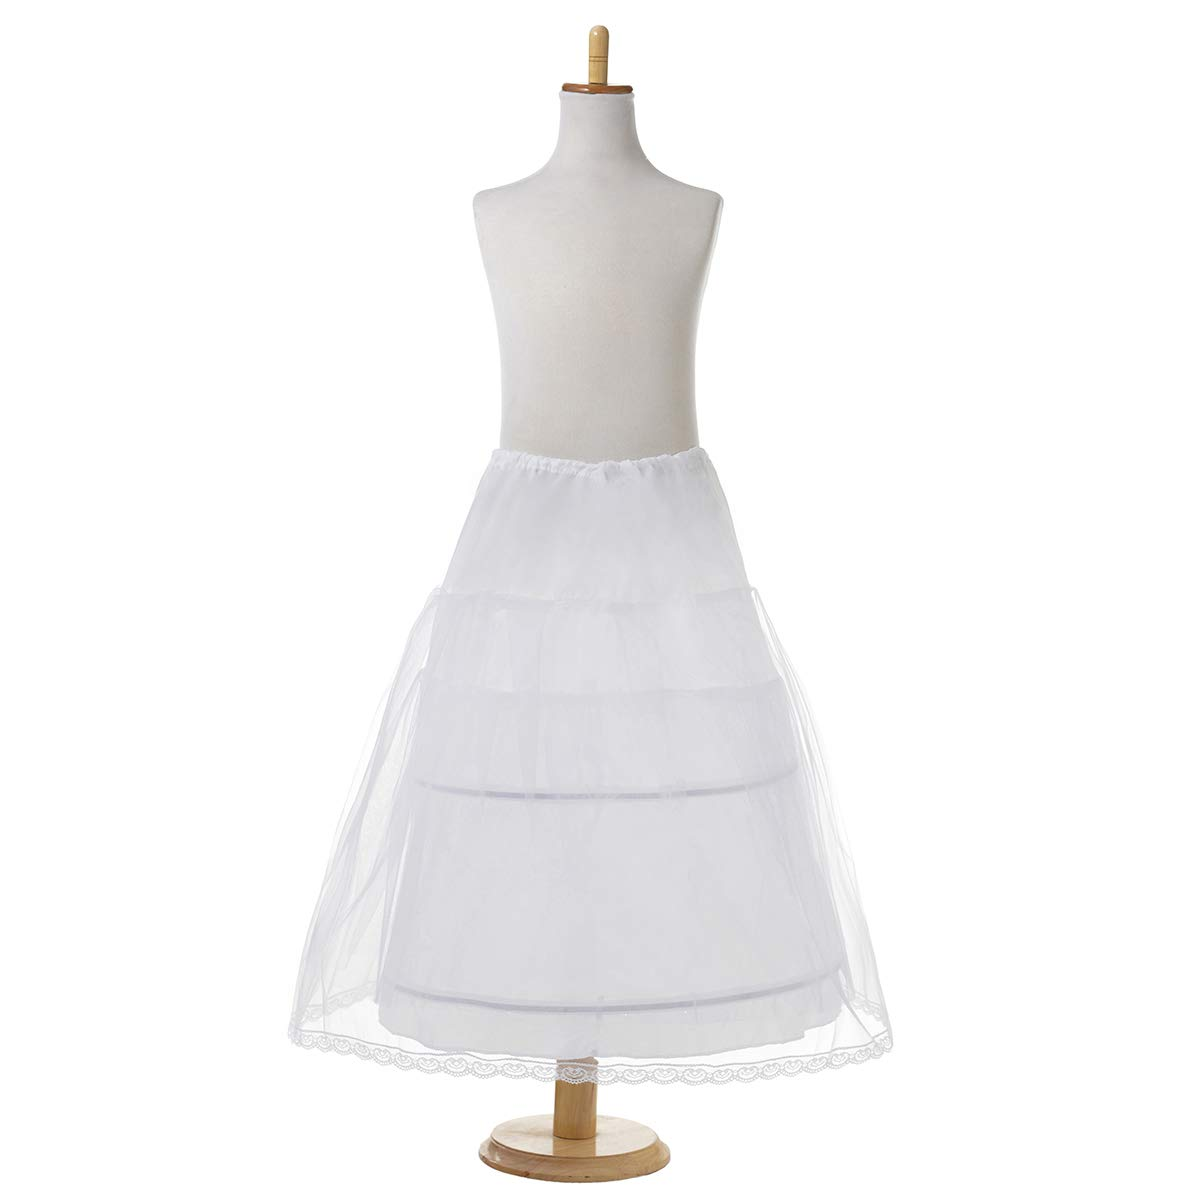 AWEI Girls Ball Gown Petticoat 3 Layers 2 Hoops Kids Wedding Tutu Crinoline Underskirt